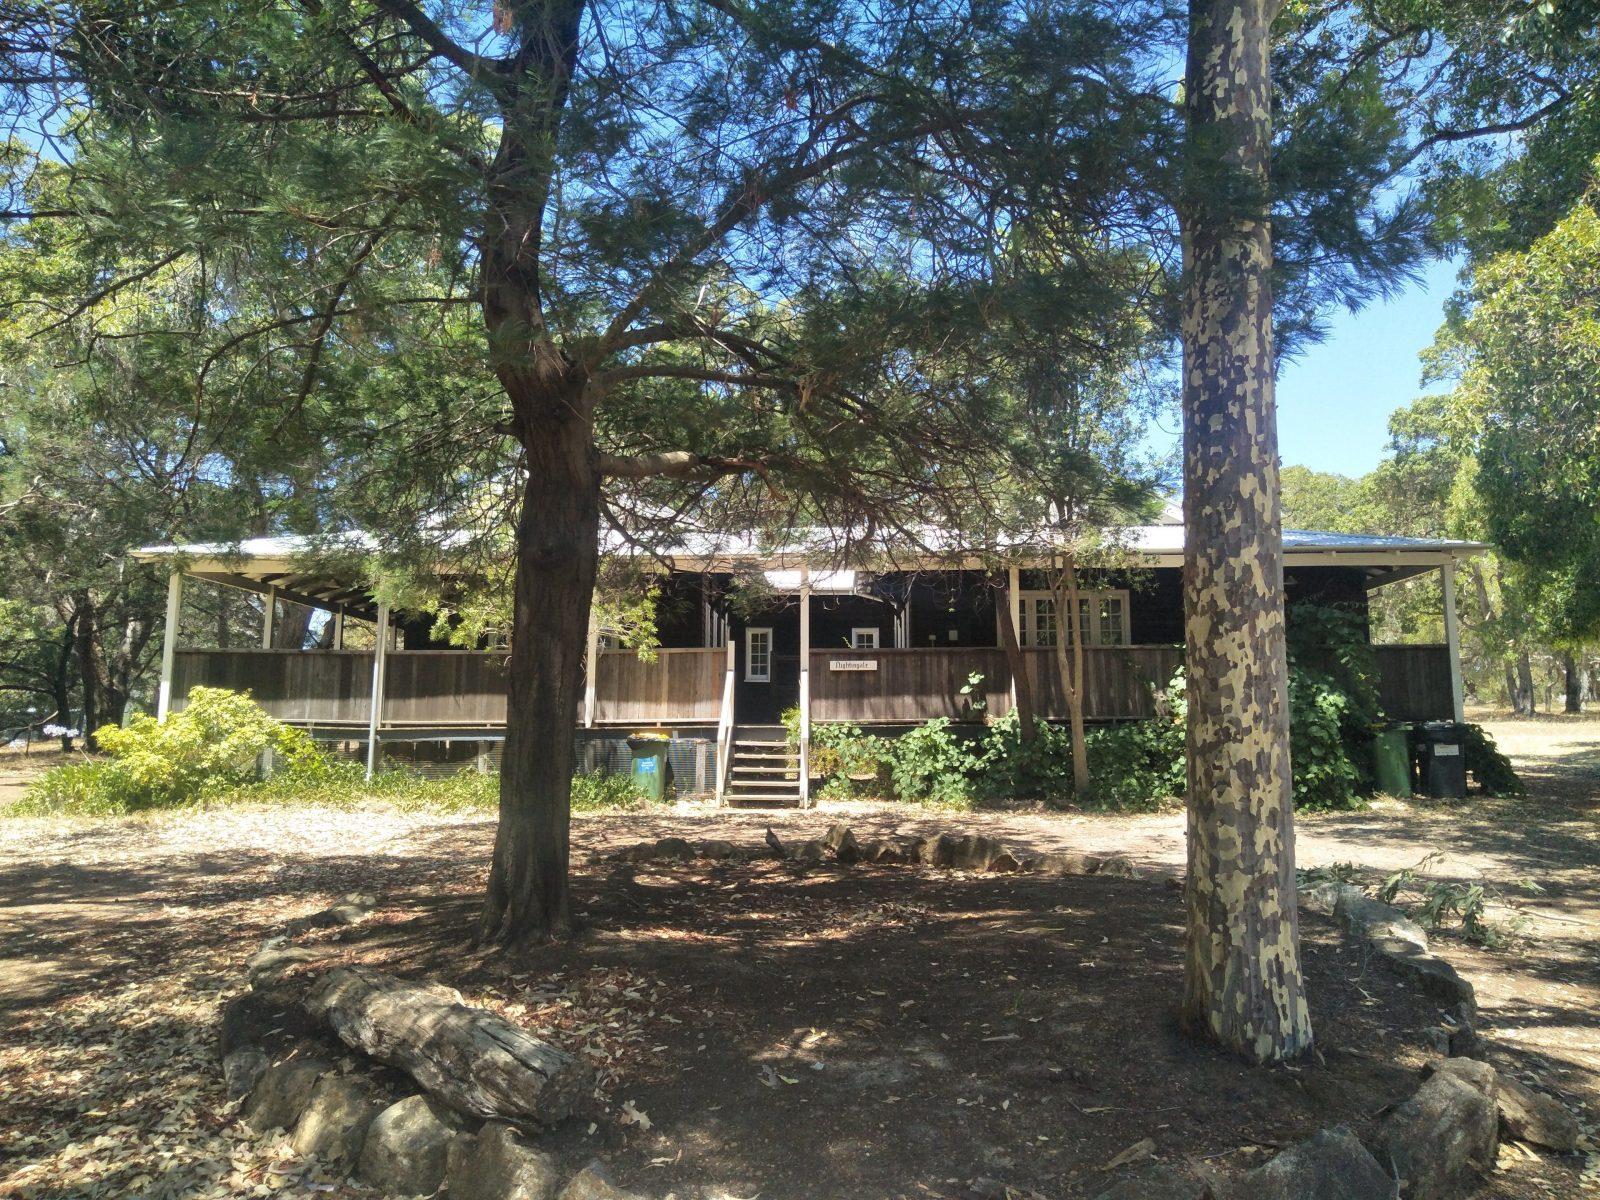 Fairbridge Village, Pinjarra, Western Australia